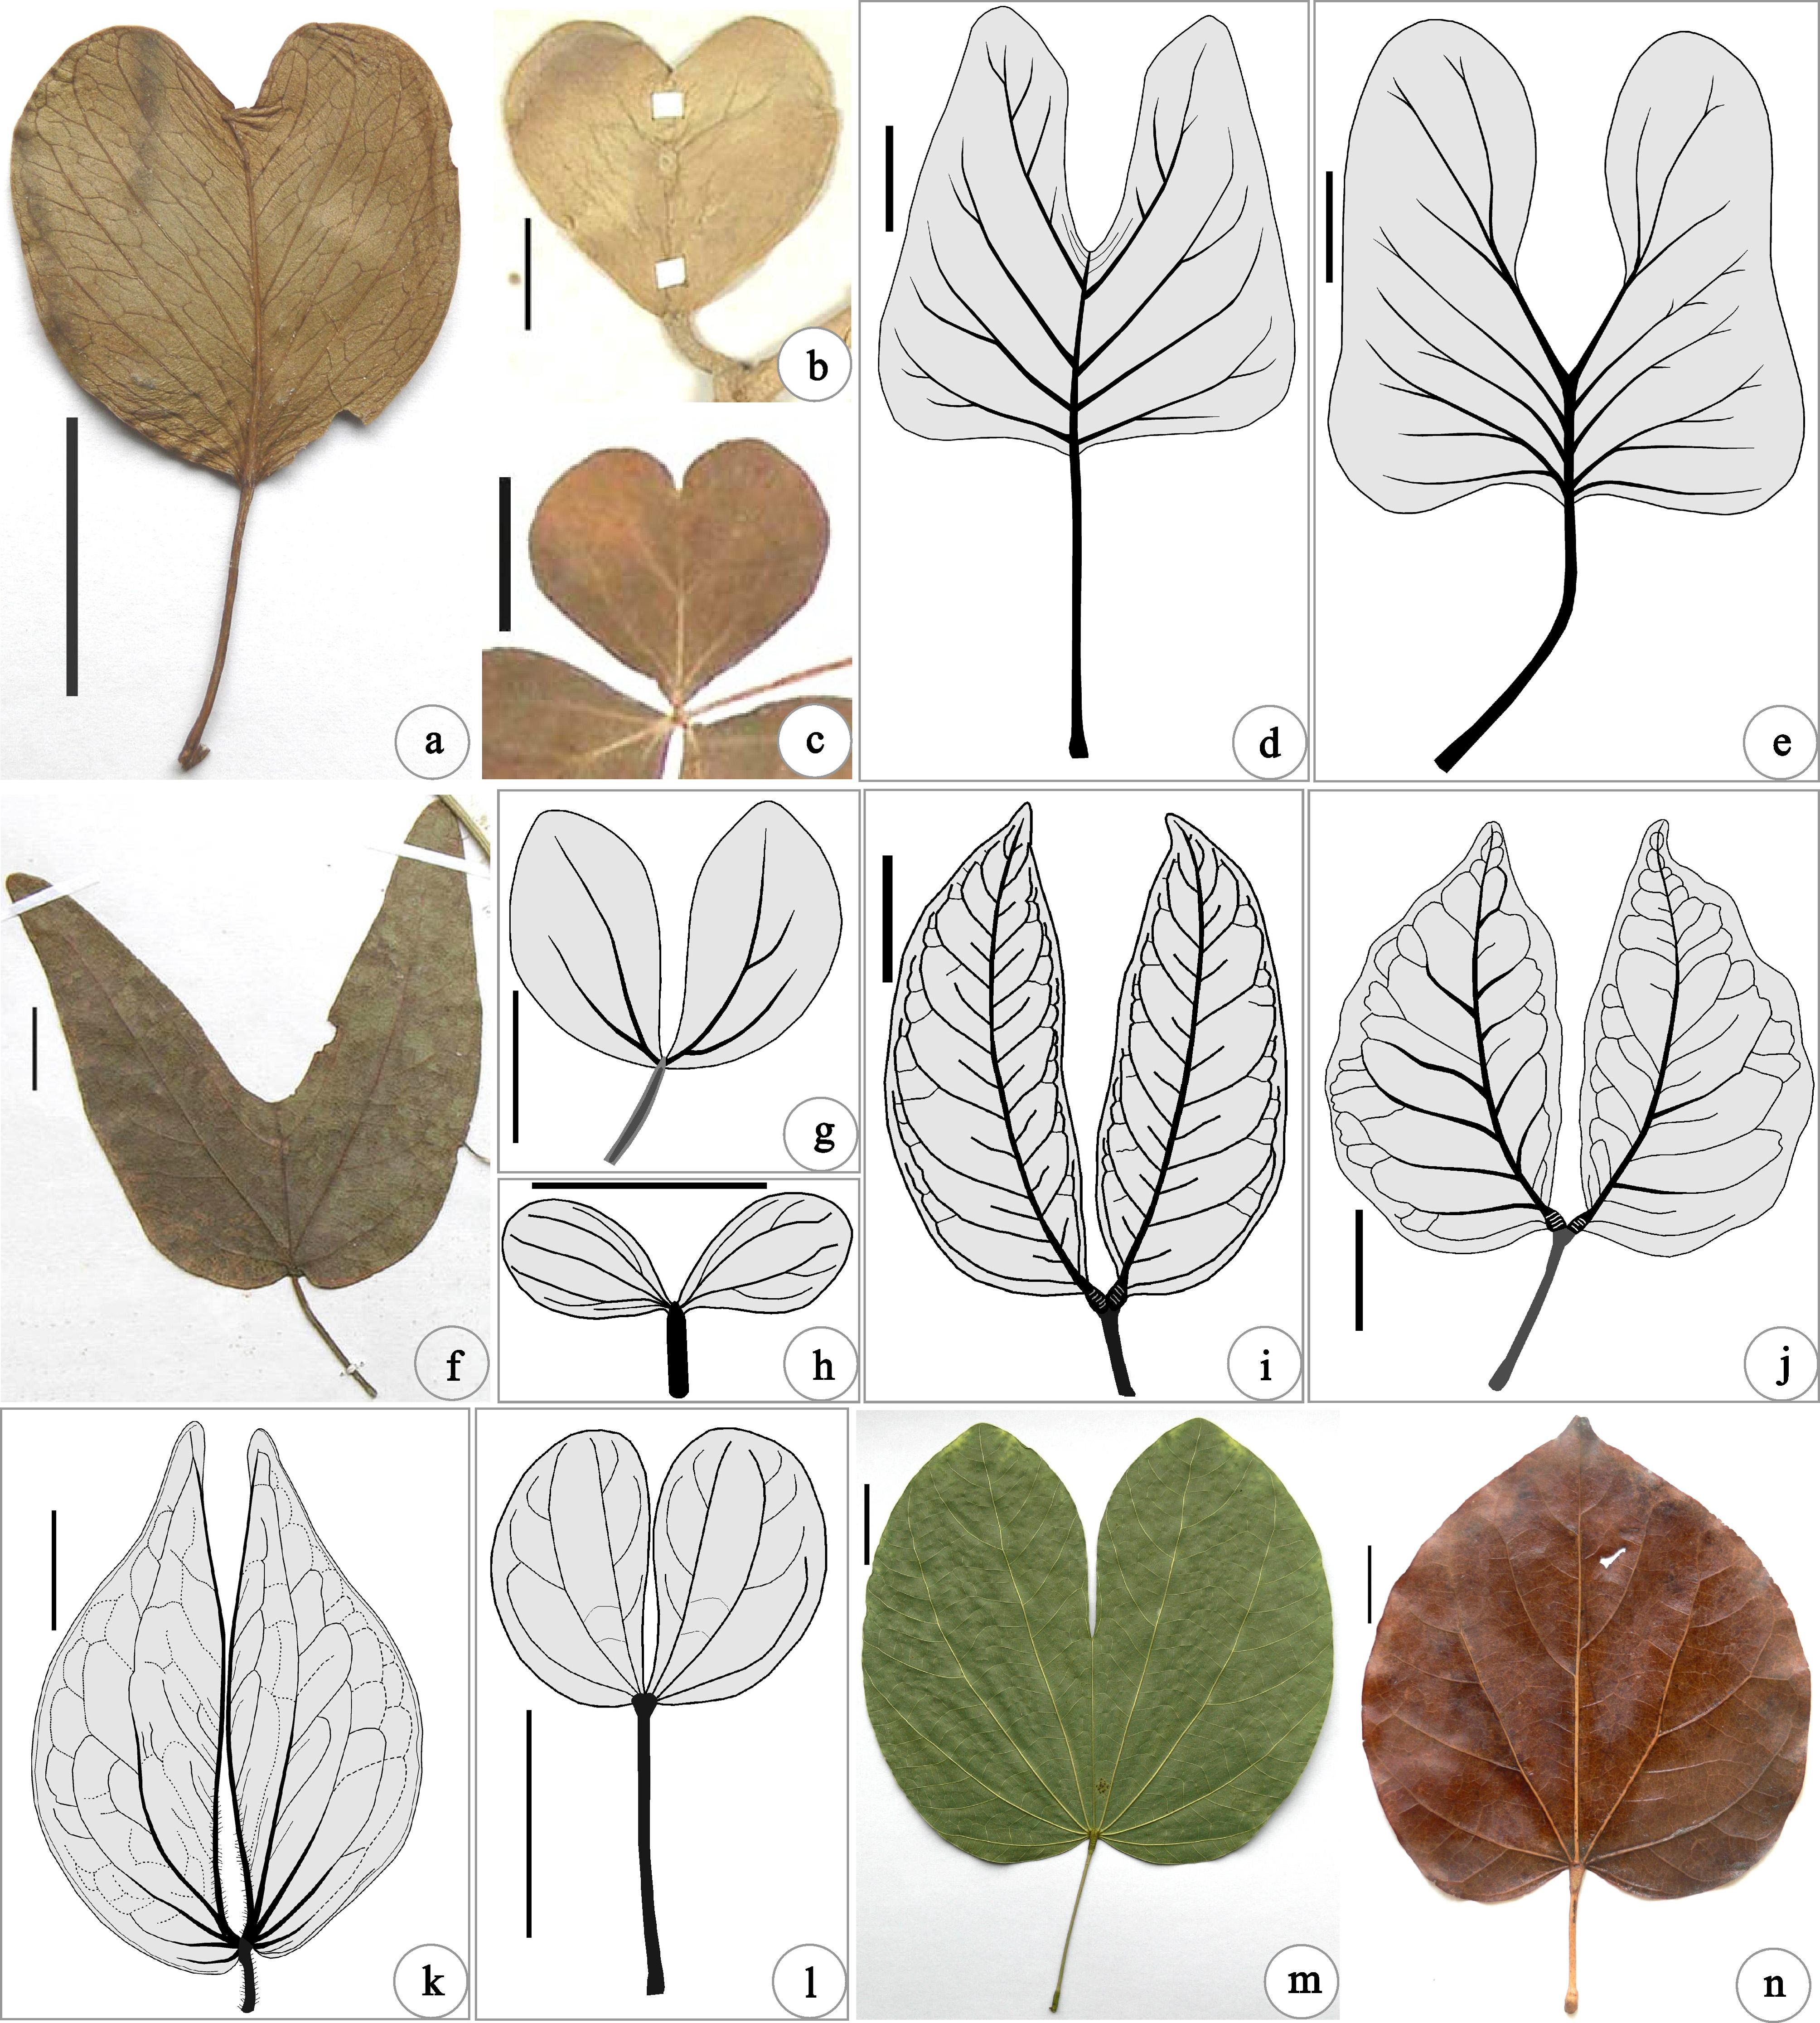 Leaves and fruits of Bauhinia (Leguminosae, Caesalpinioideae.